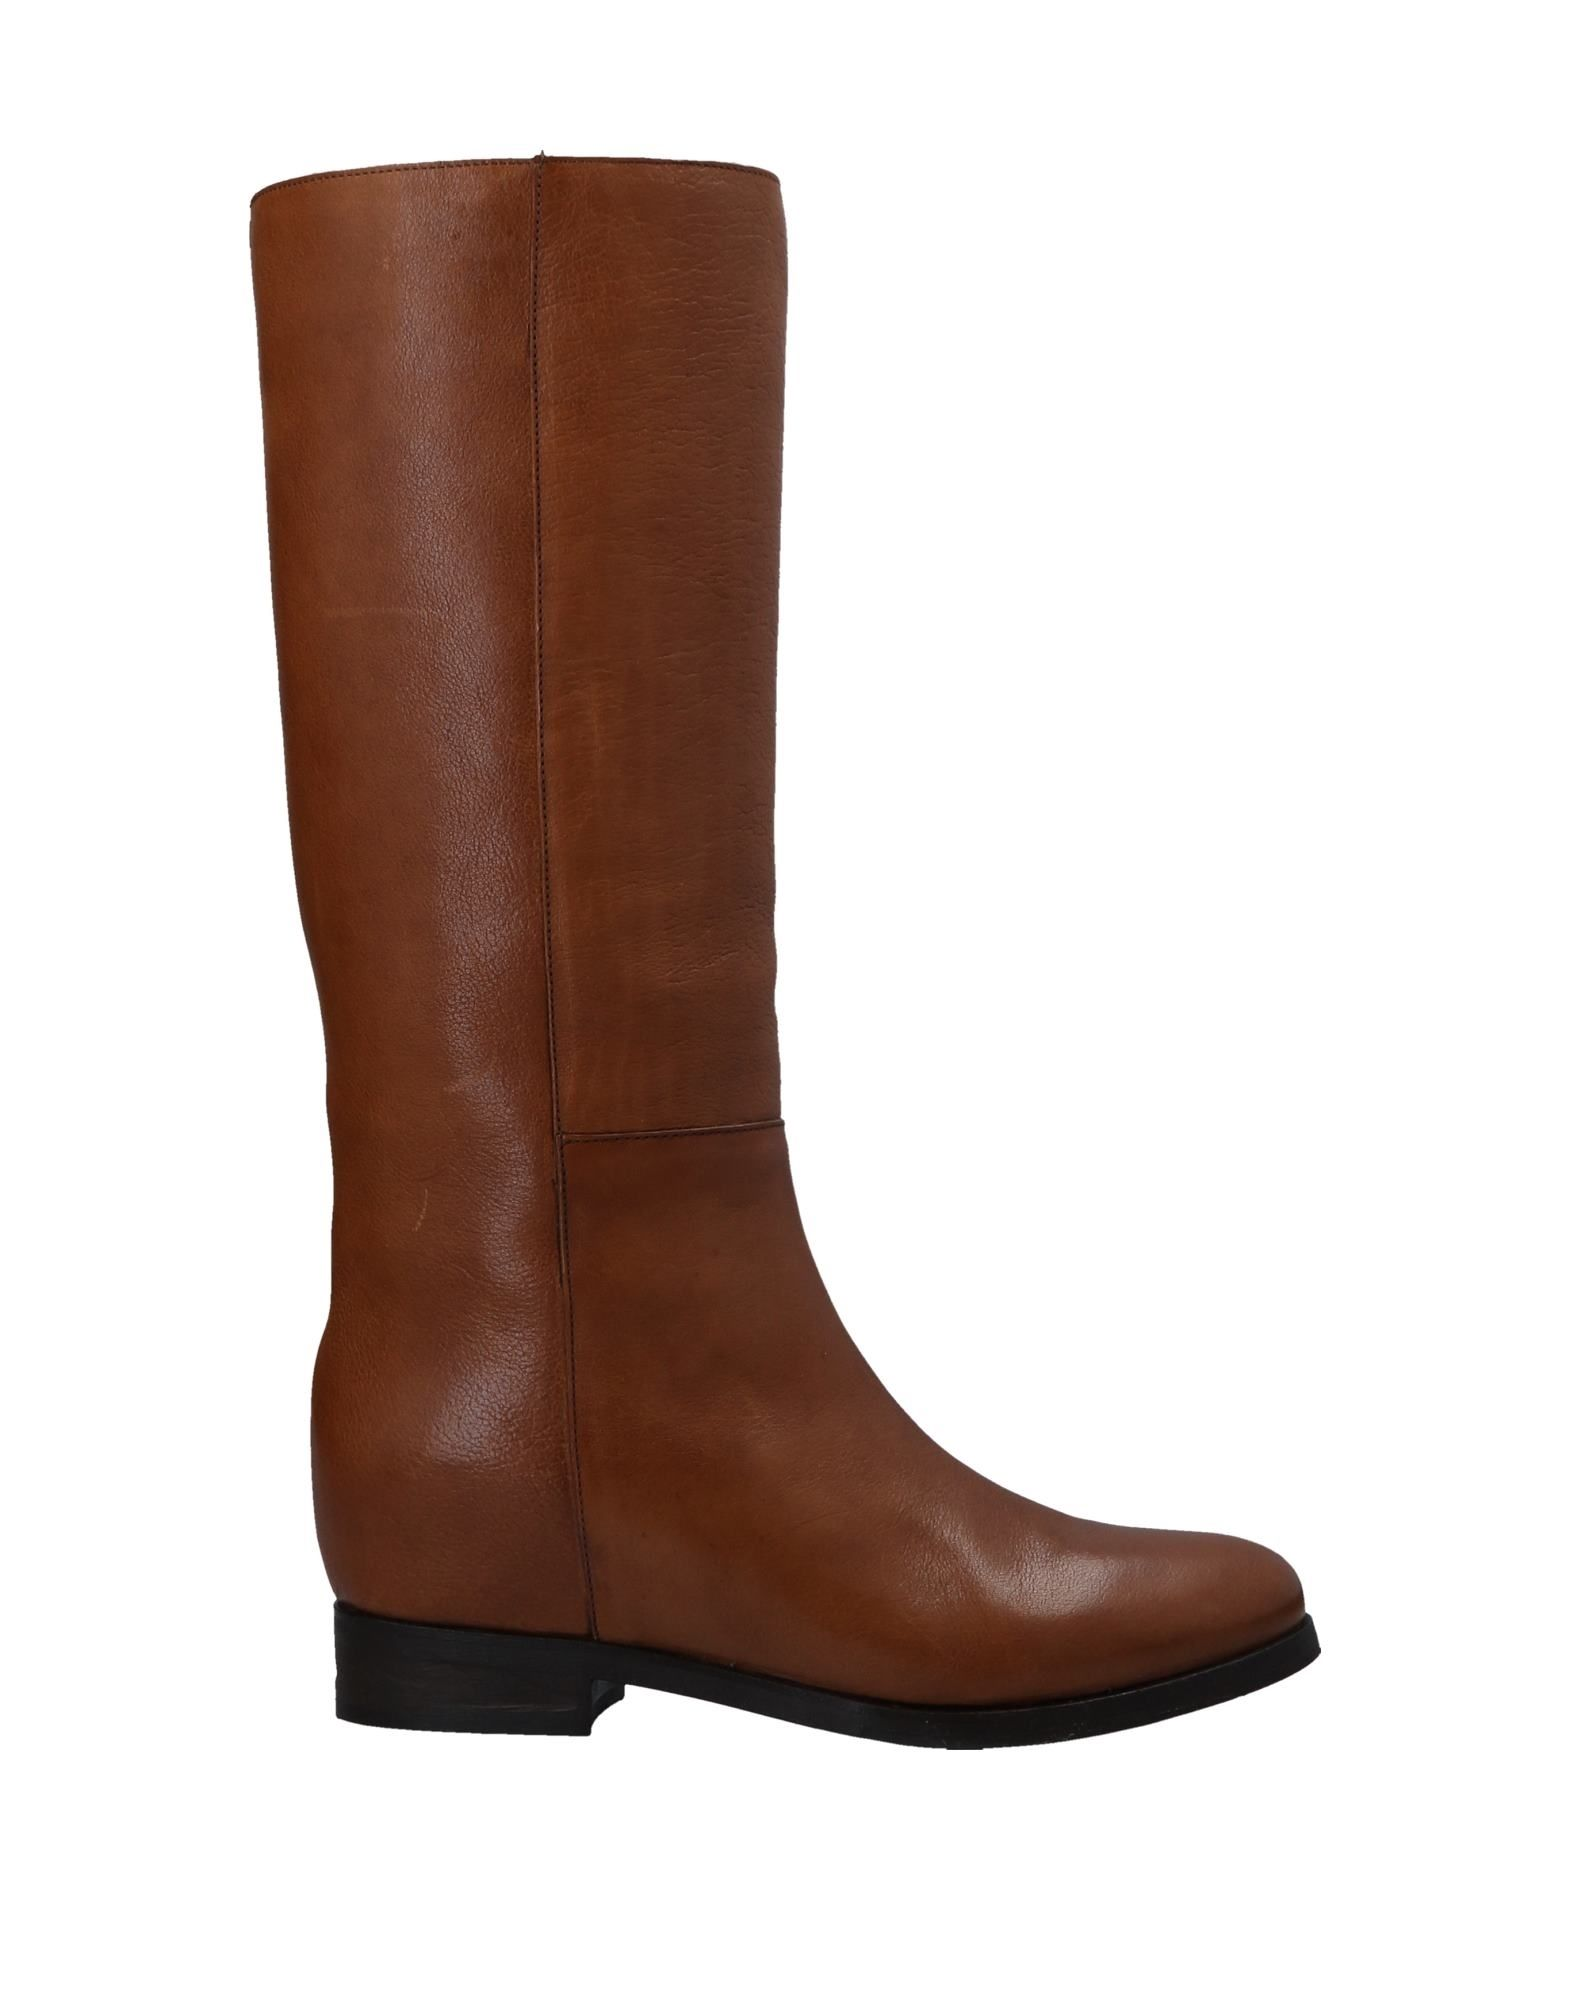 L' Autre Chose Stiefel Damen  11542971CEGut aussehende strapazierfähige Schuhe